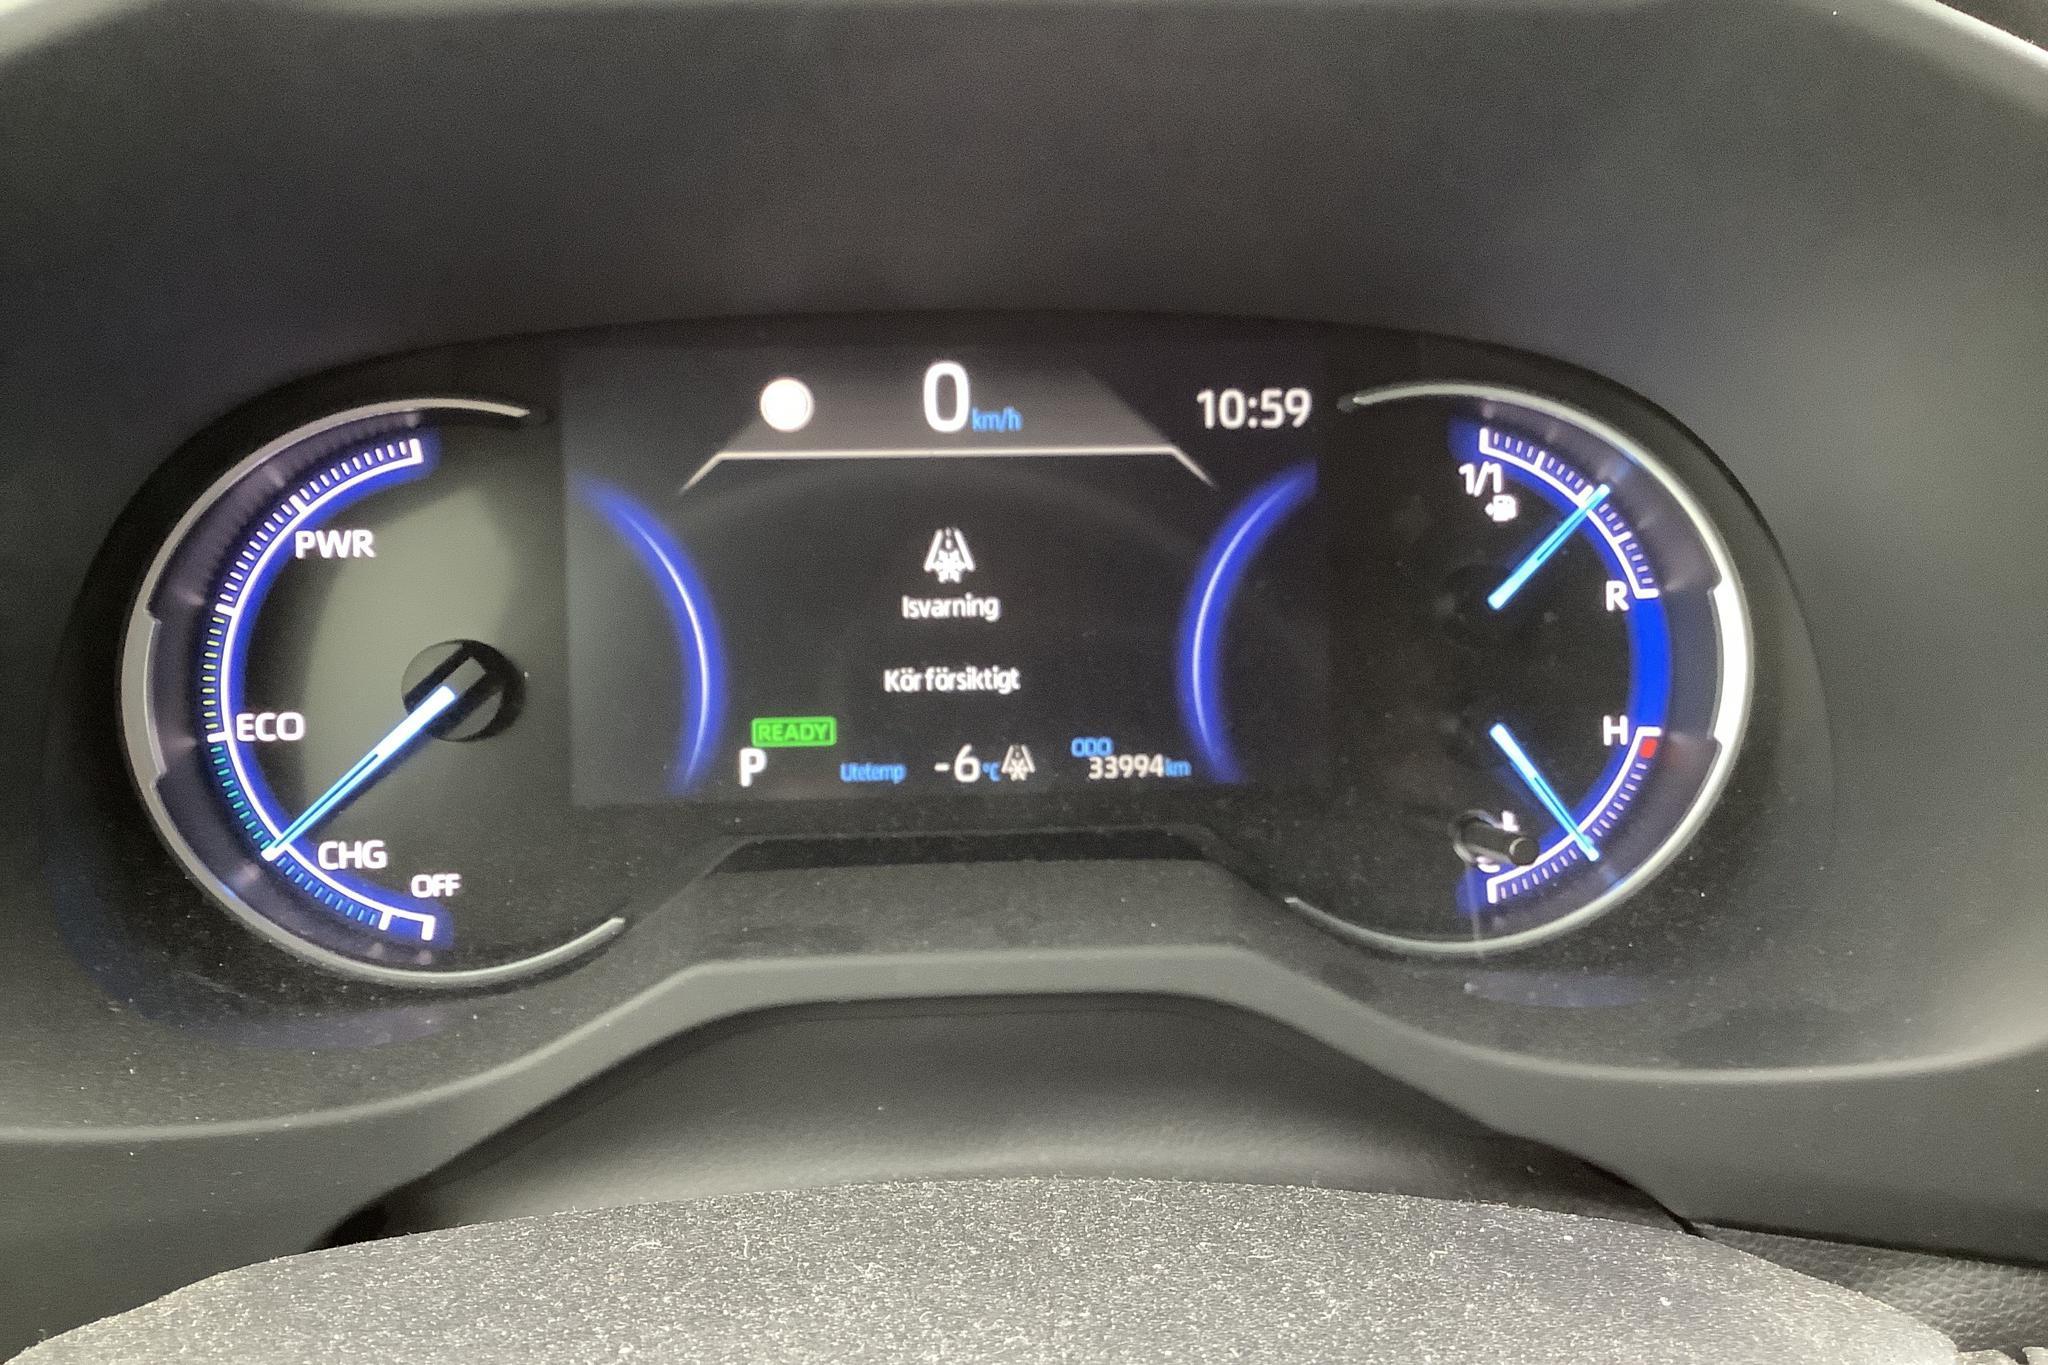 Toyota RAV4 2.5 HSD AWD (222hk) - 3 399 mil - Automat - grå - 2019